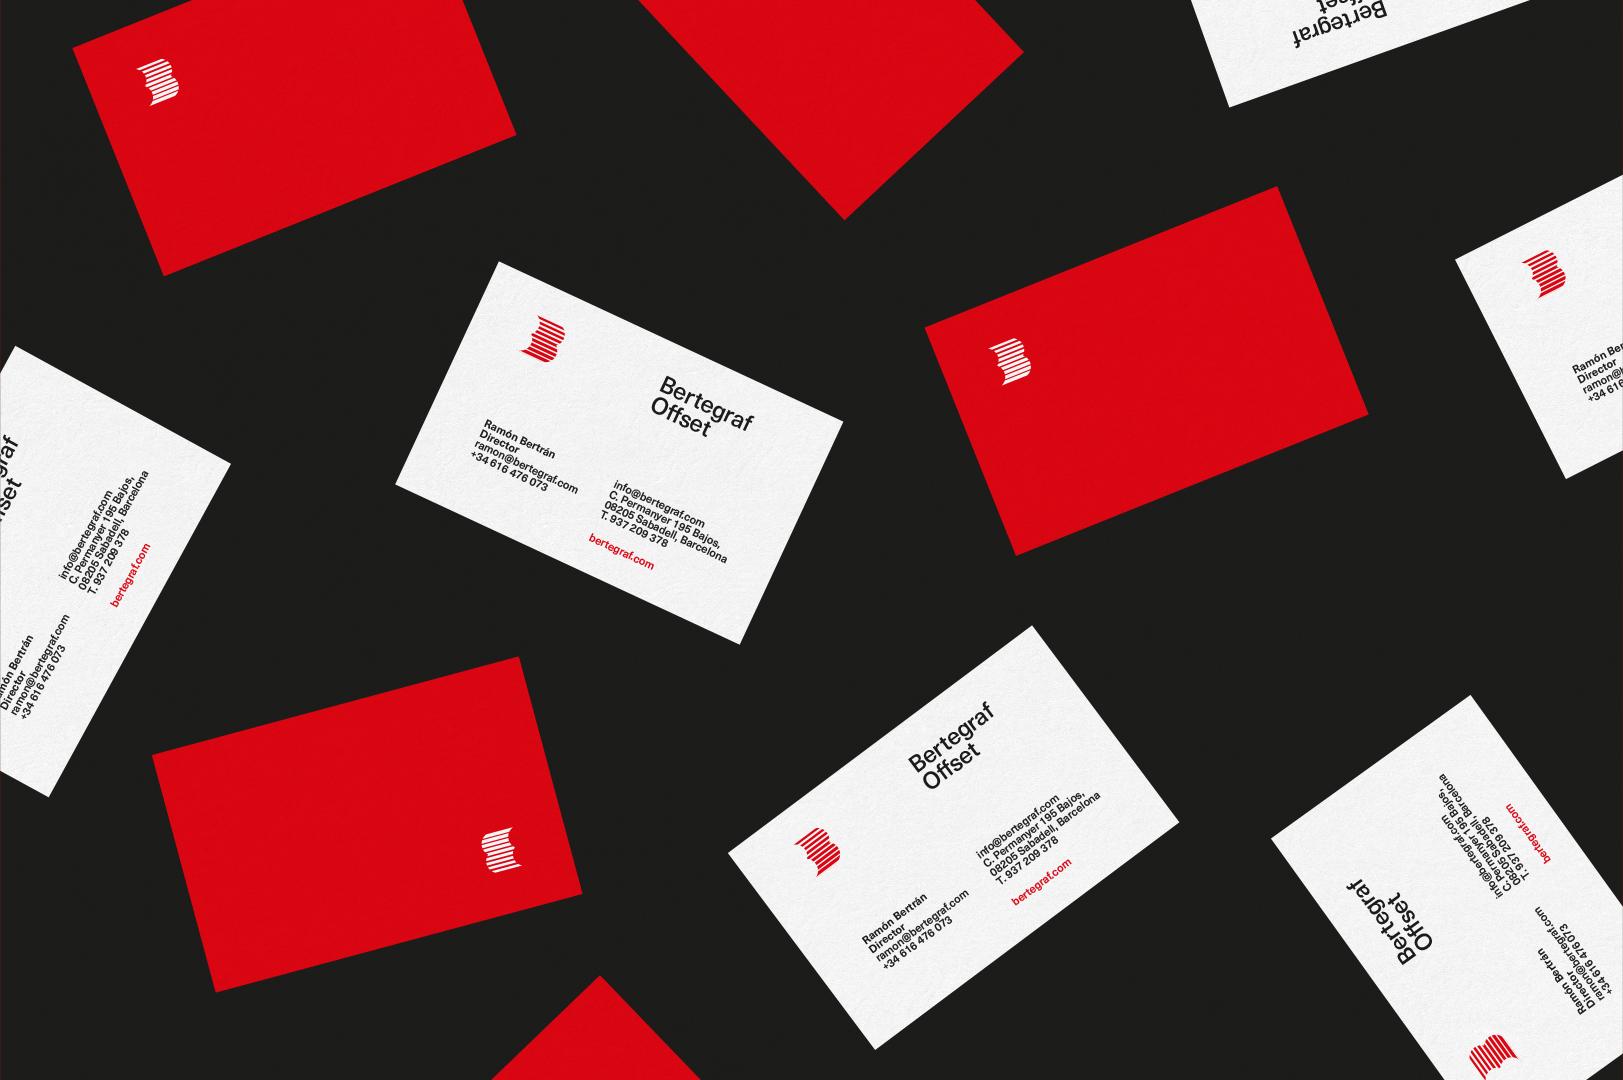 bertegraf-targetes-disseny-grafic